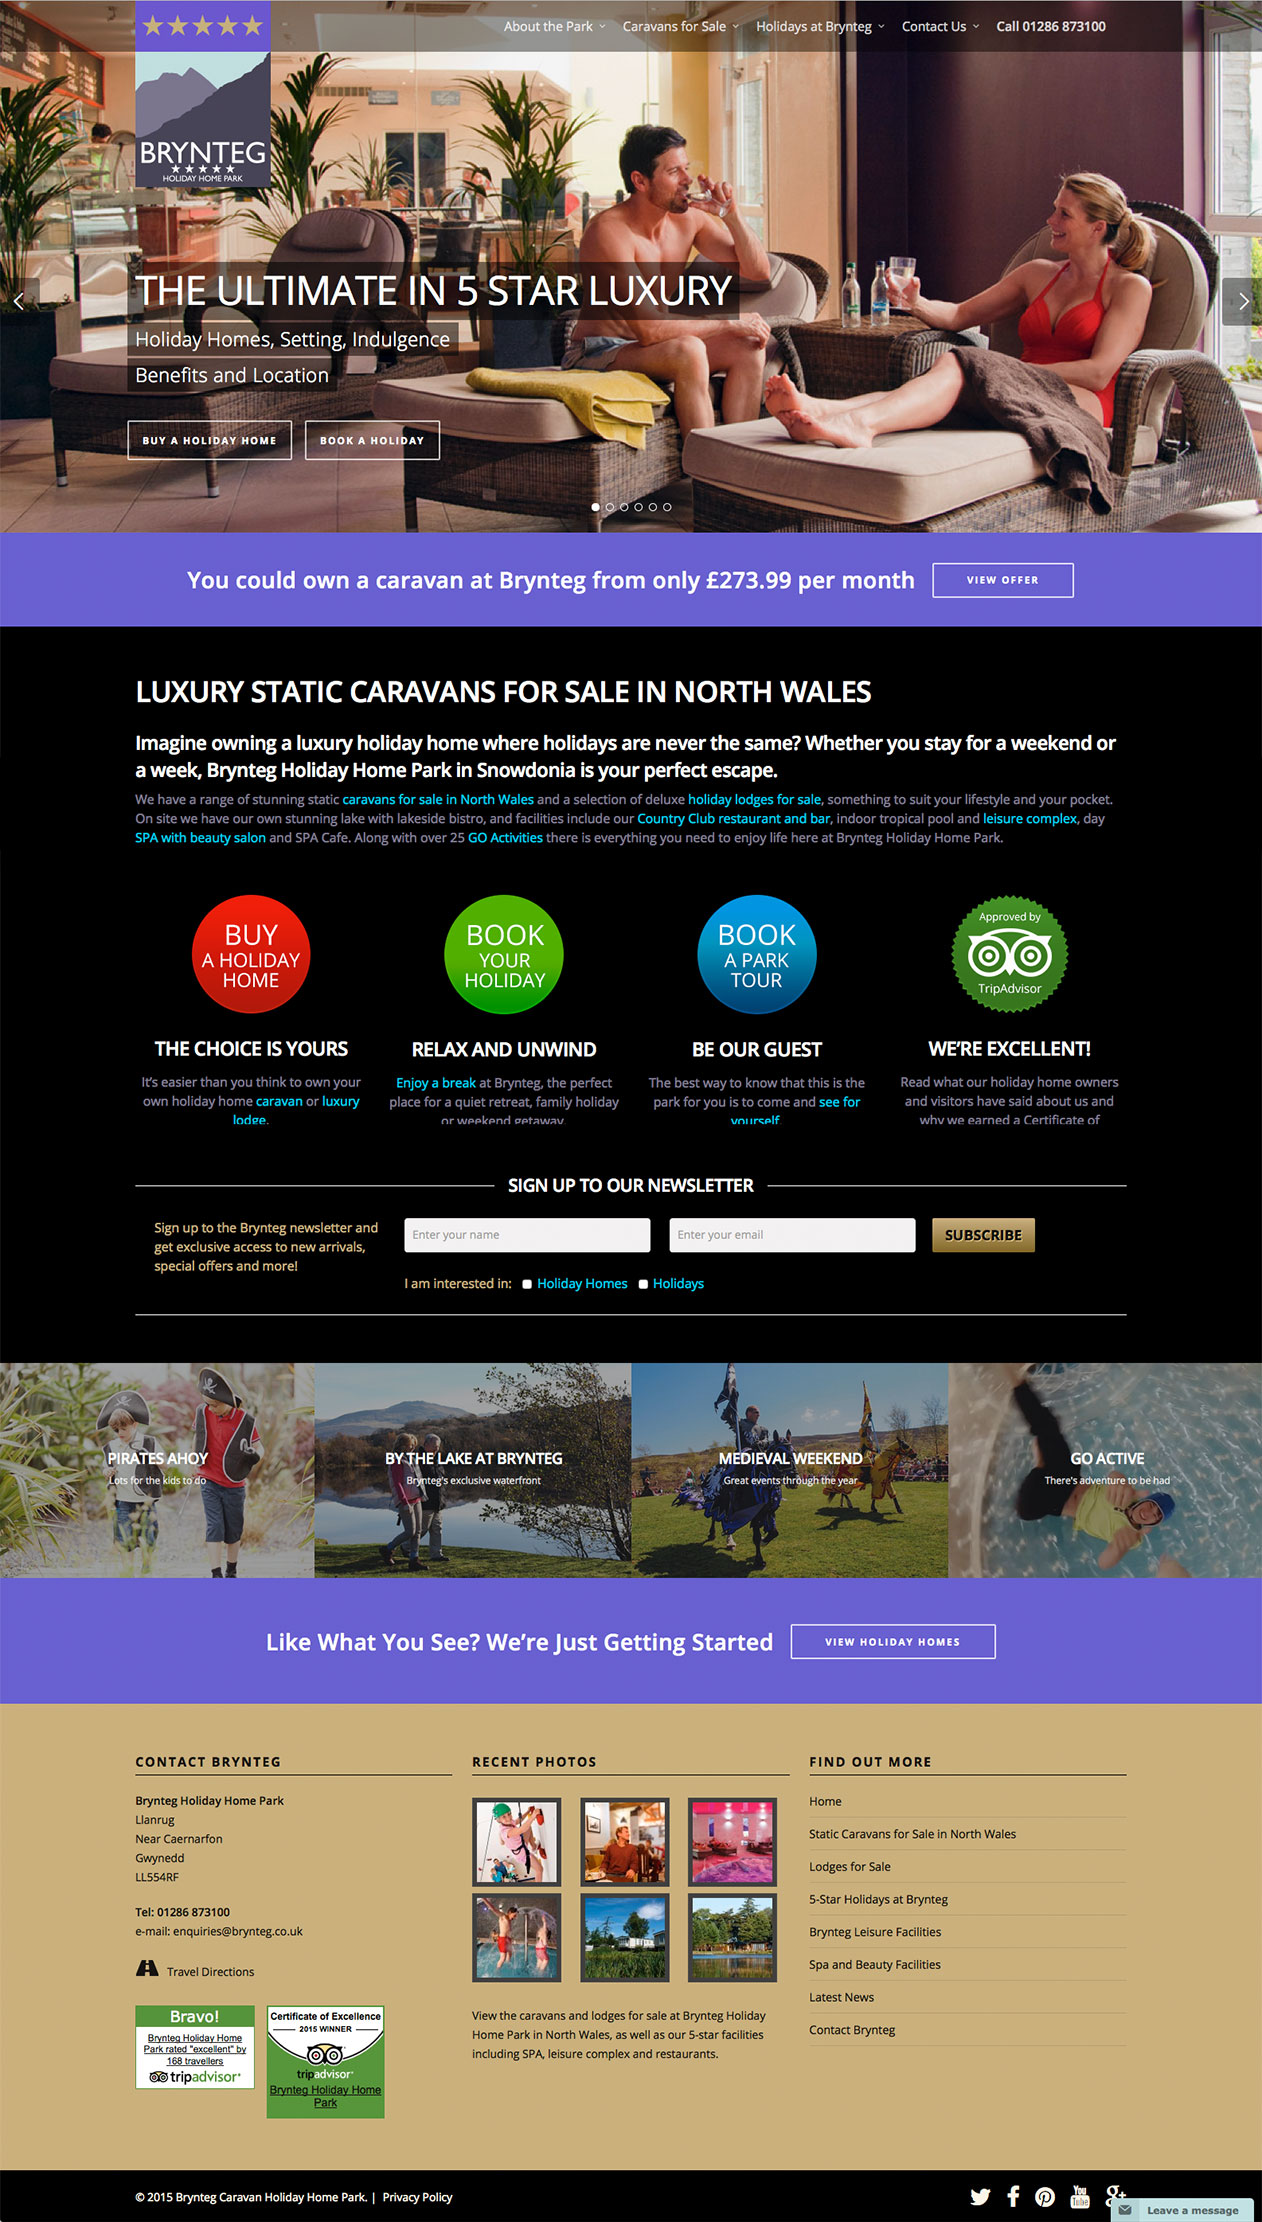 Brynteg Holiday Home Park website design by Artychoke